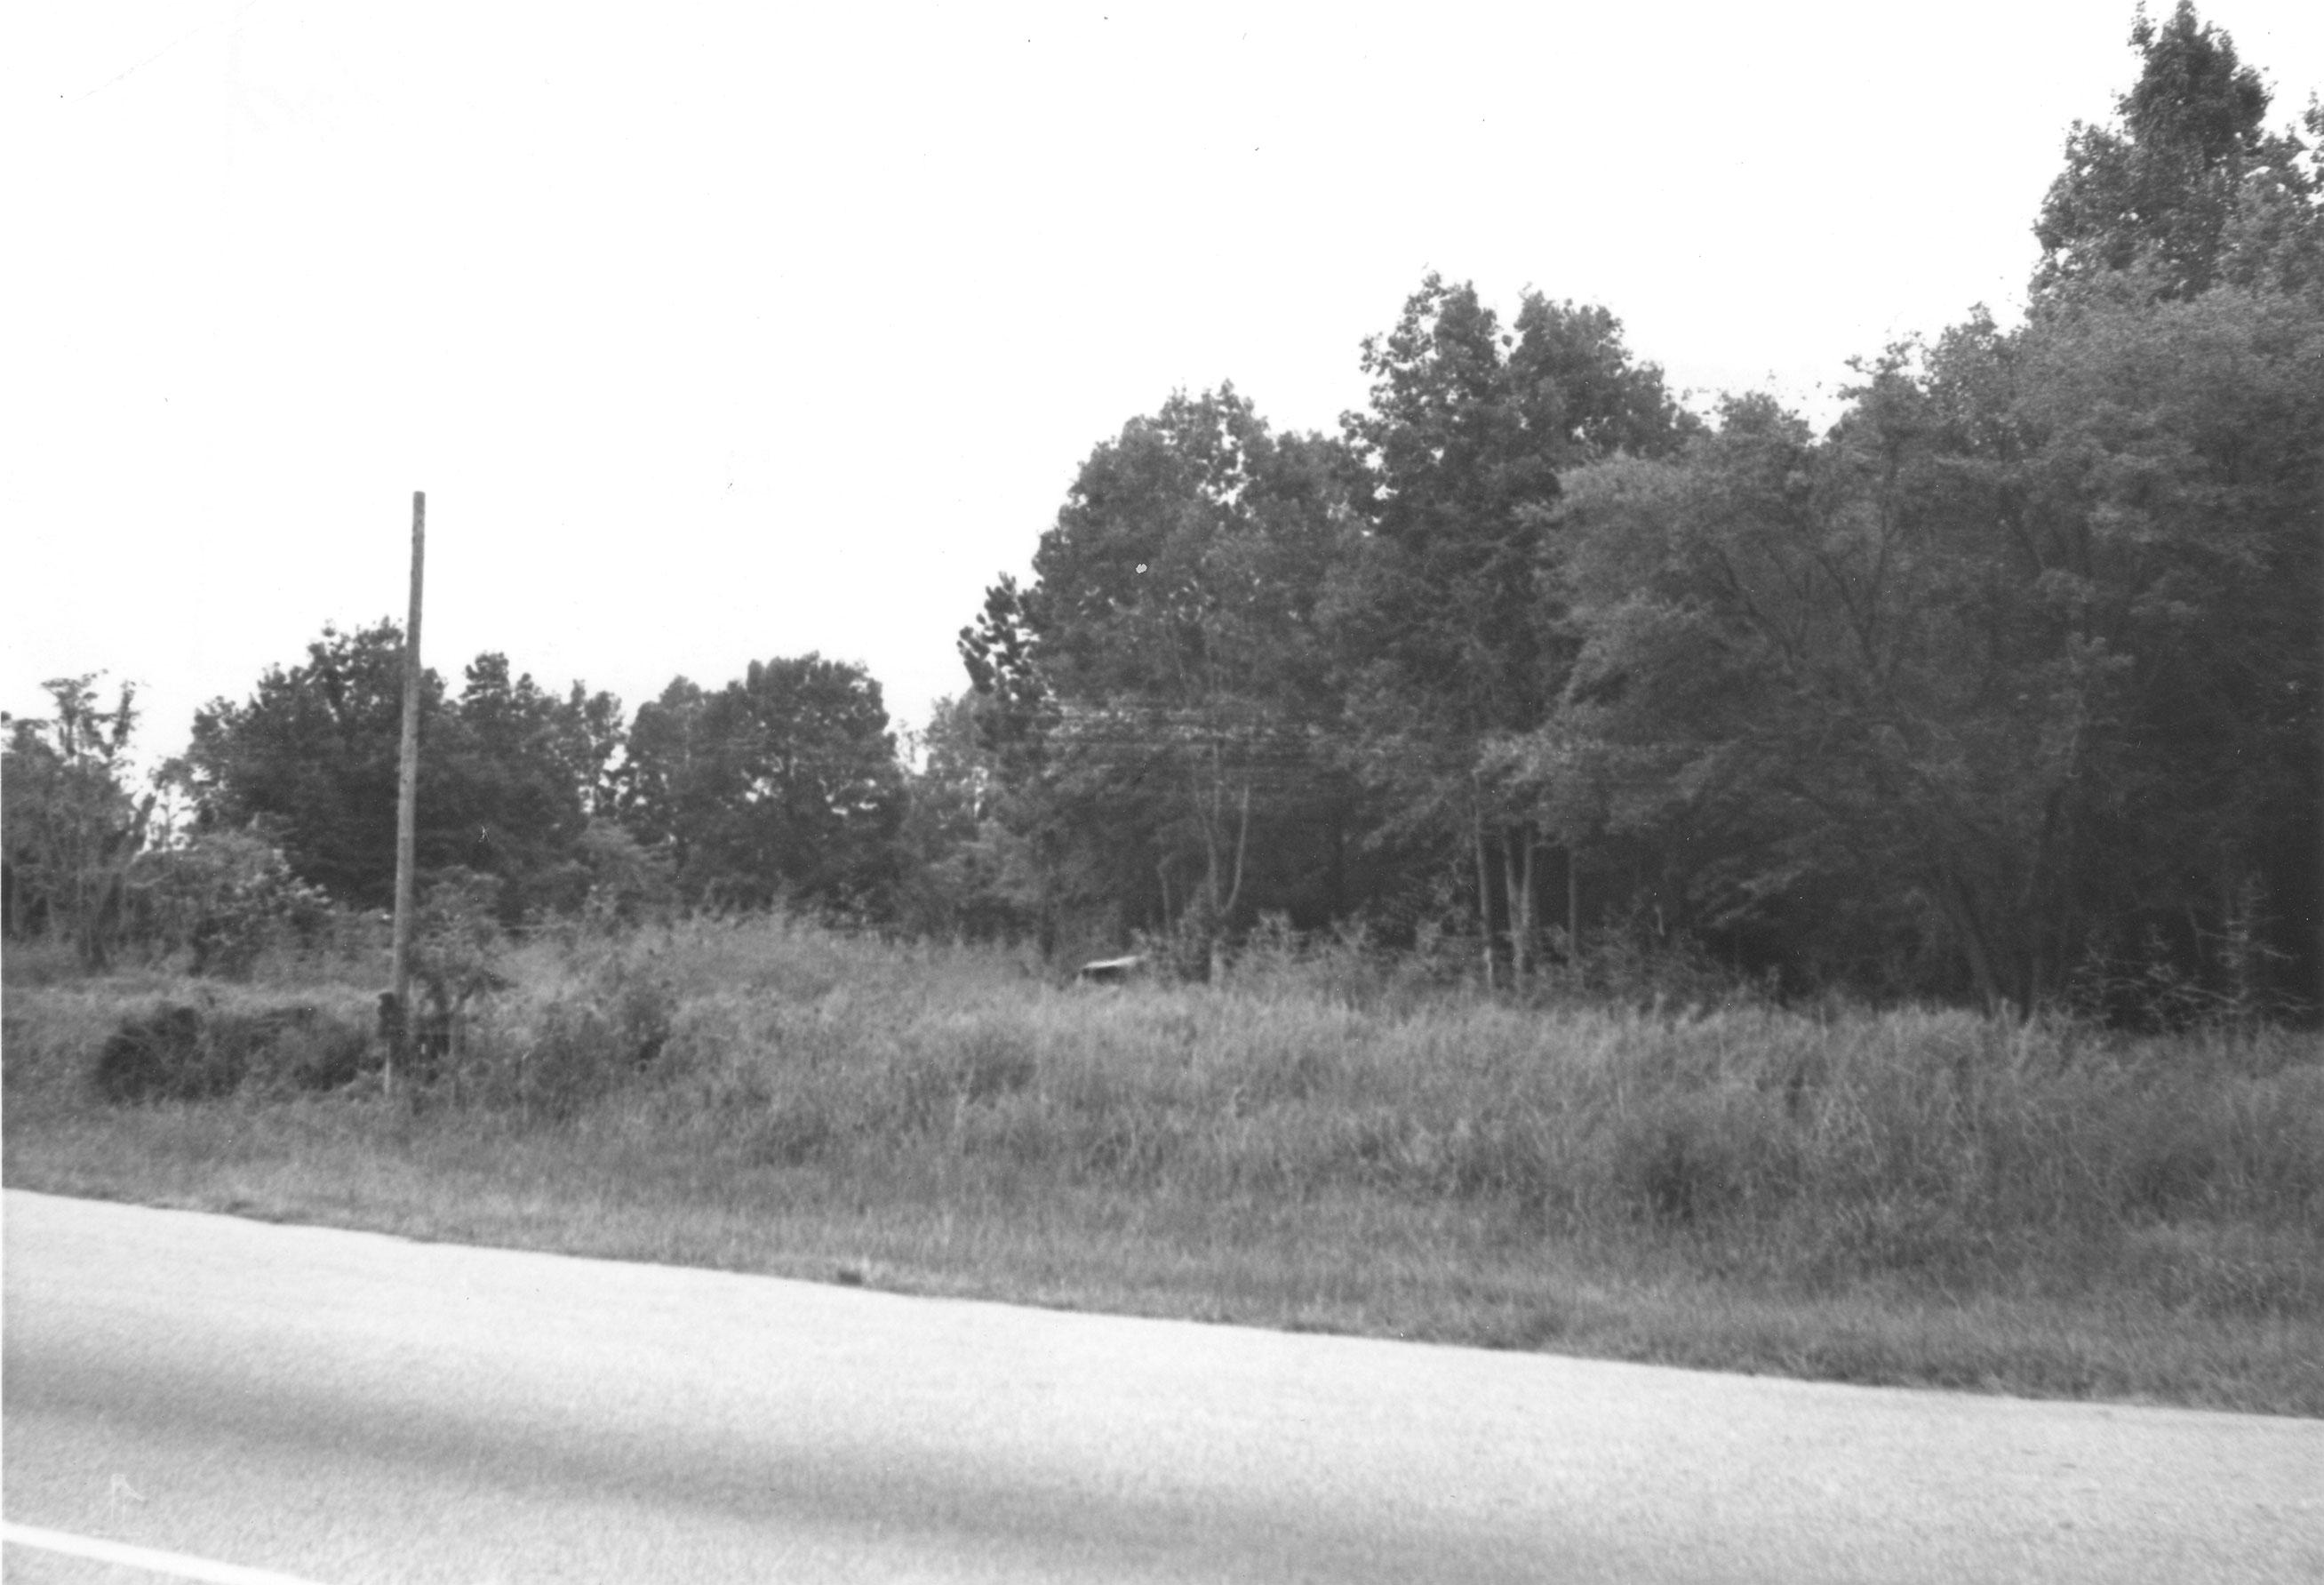 US Route 17 Photo 639